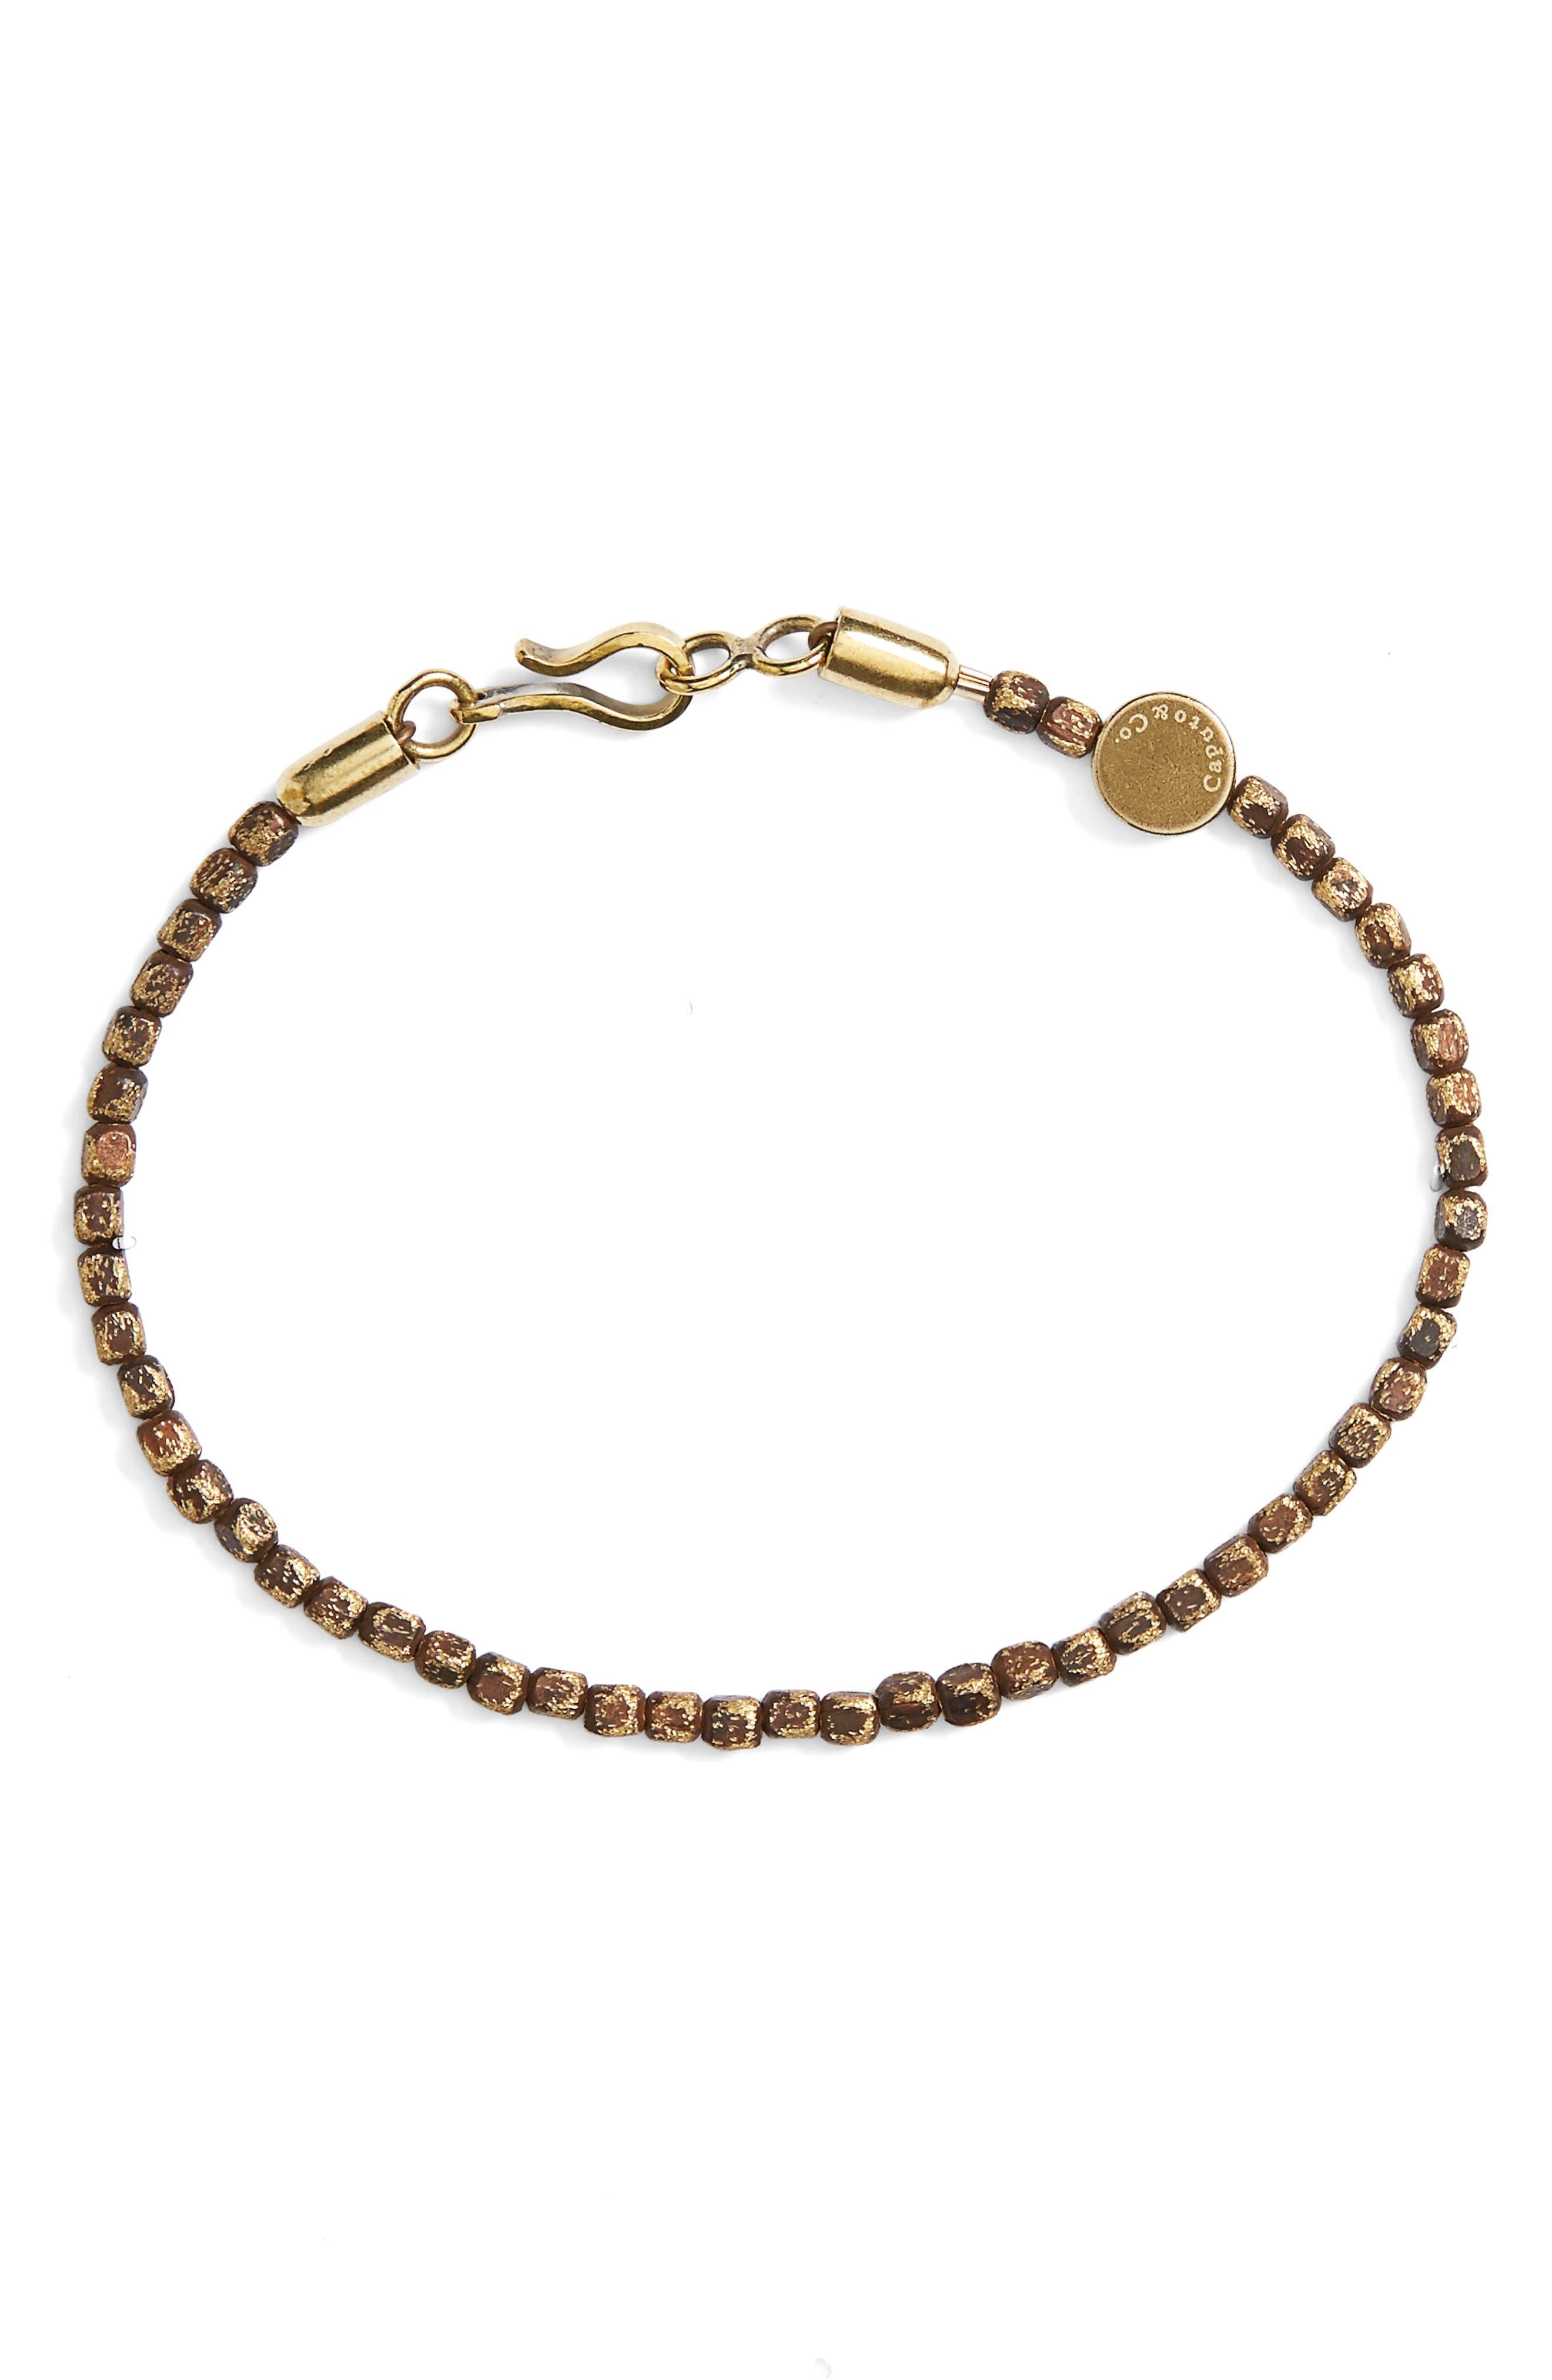 Alternate Image 1 Selected - Caputo & Co. Brass Bead Bracelet